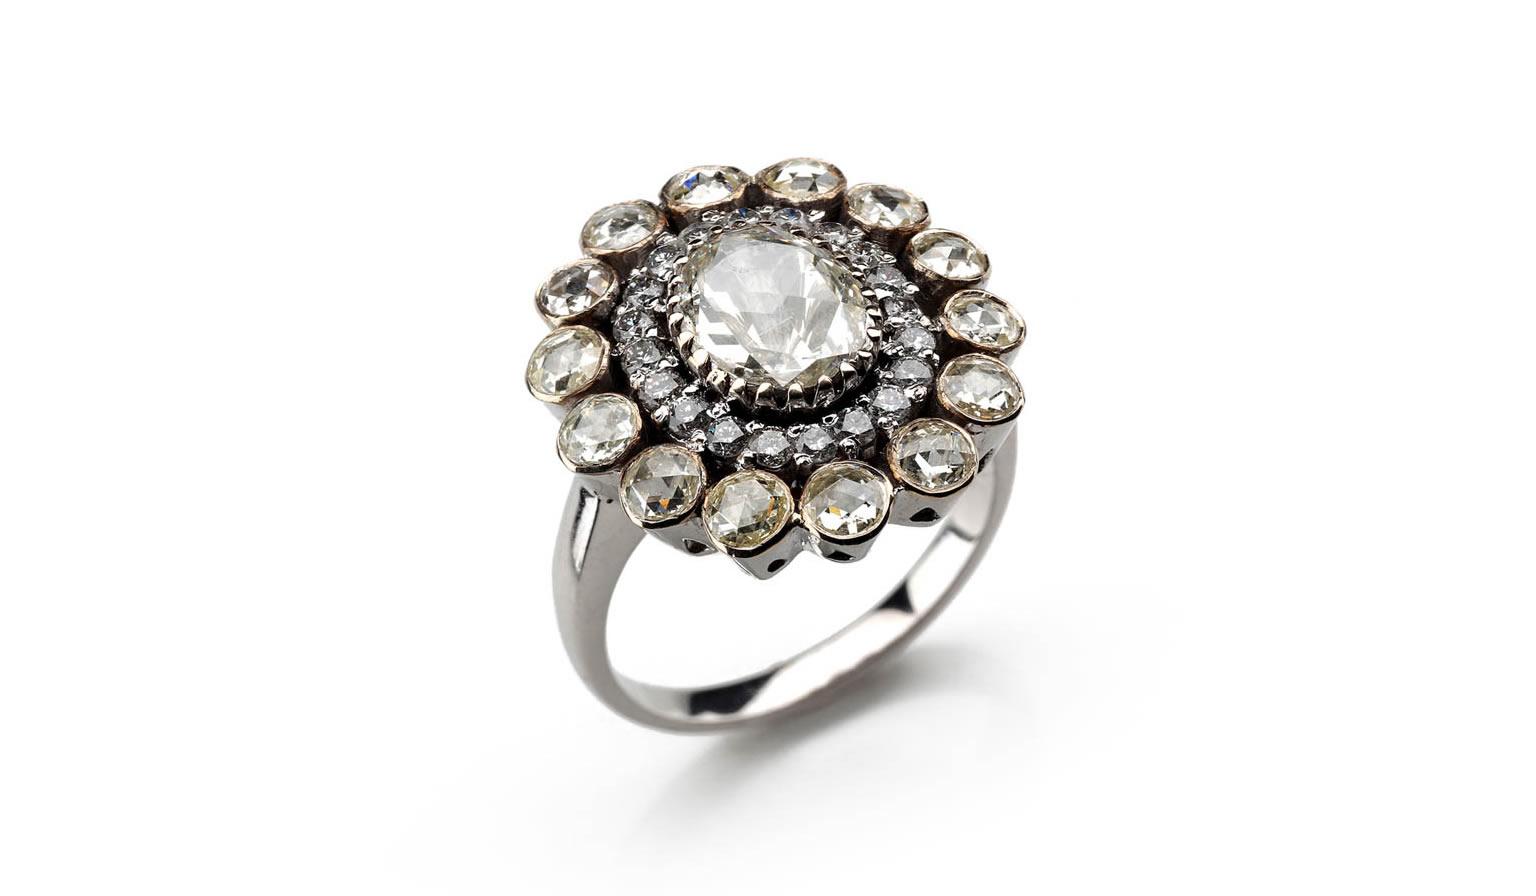 Diamond and White Gold Ring - sku 5488